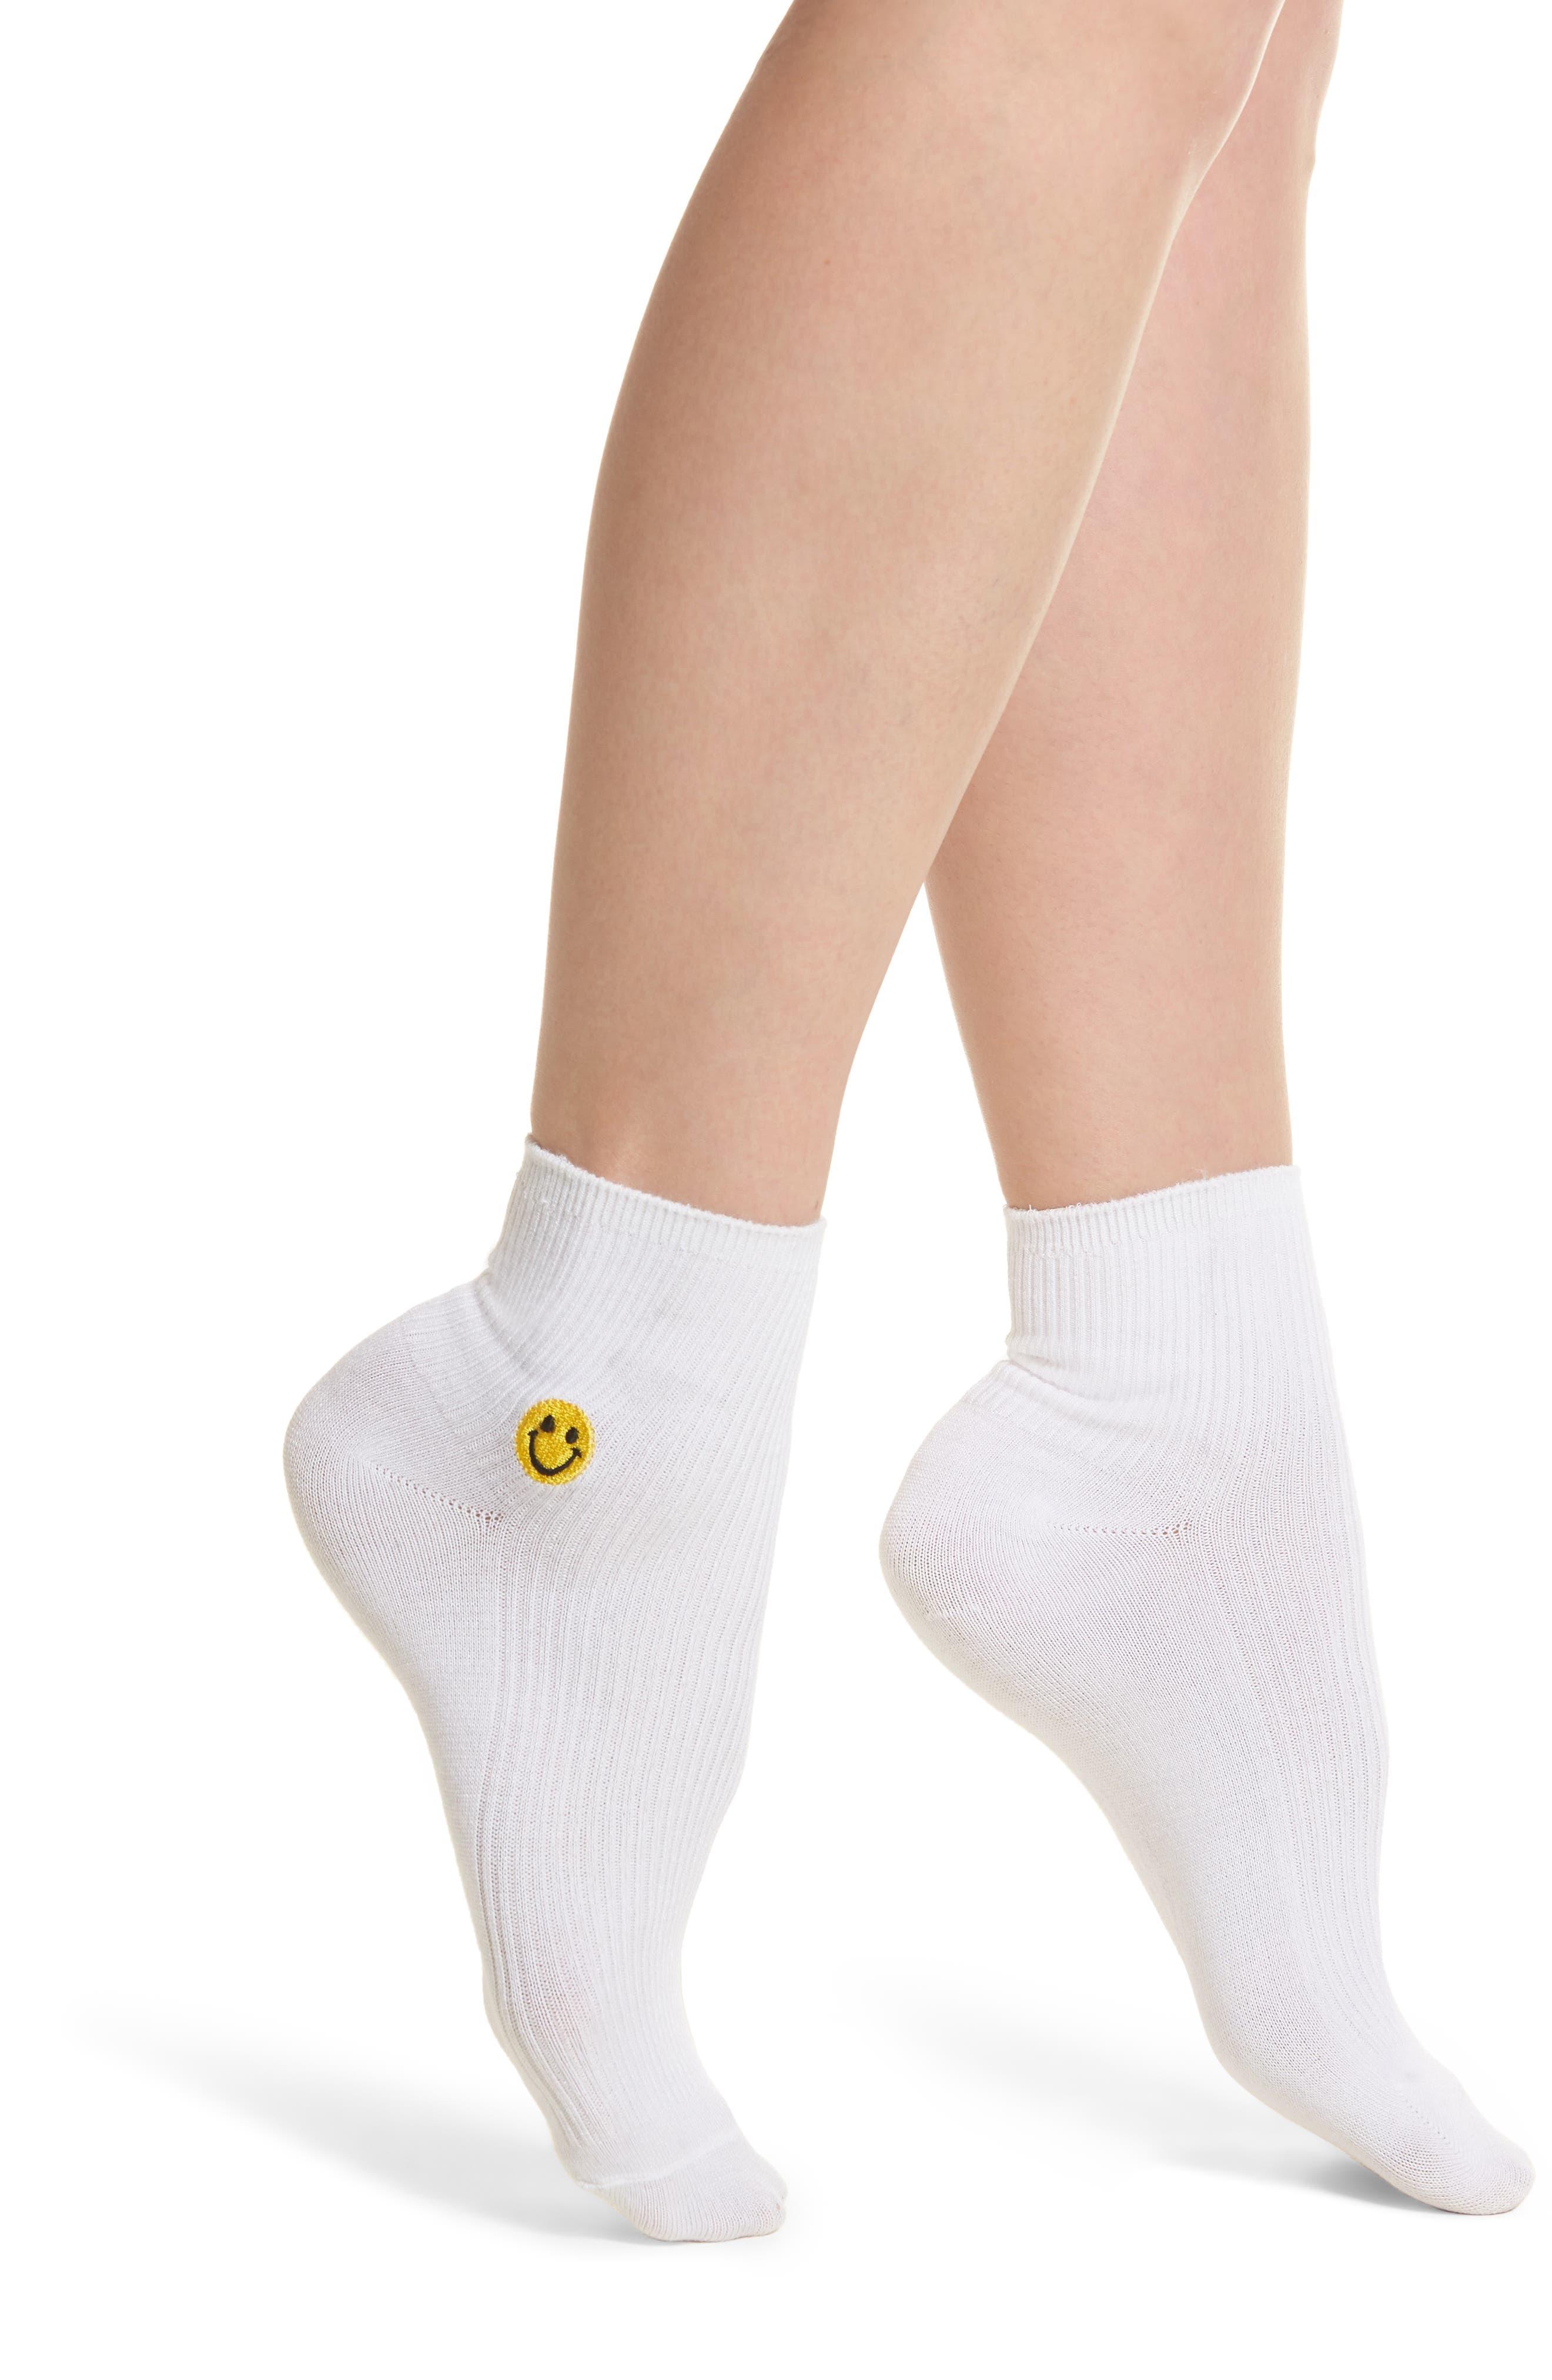 Smiles Ankle Socks,                         Main,                         color, White